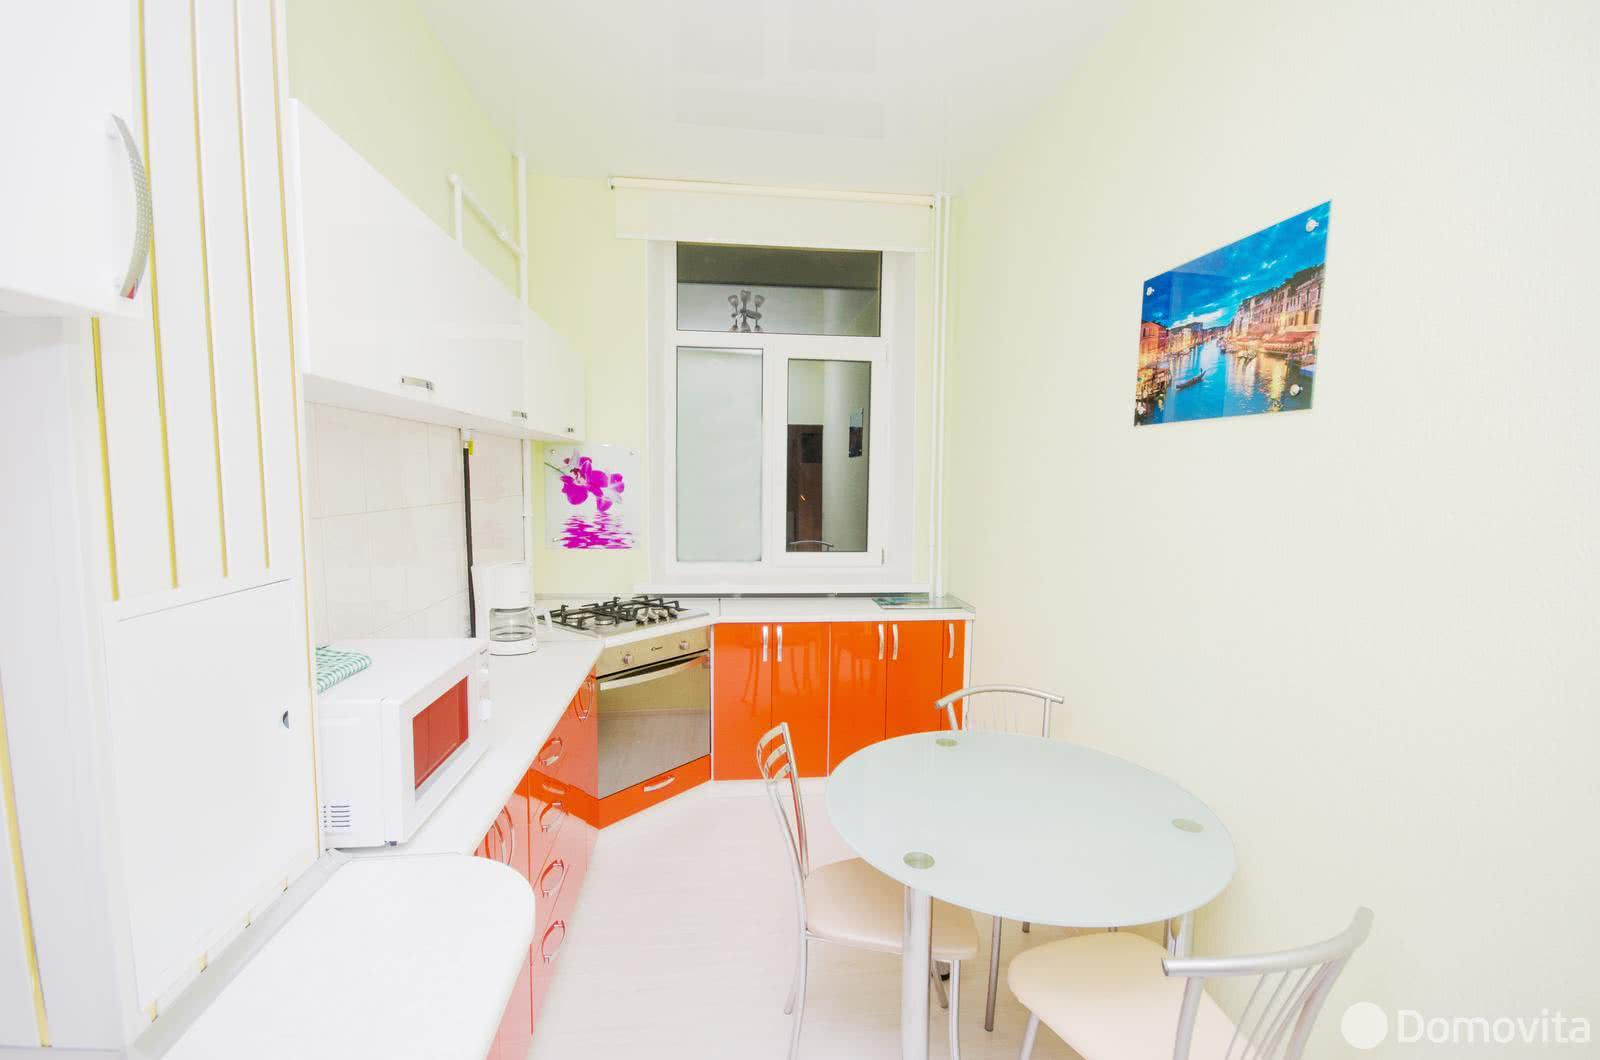 Аренда 2-комнатной квартиры на сутки в Минске пр-т Независимости, д. 40 - фото 6